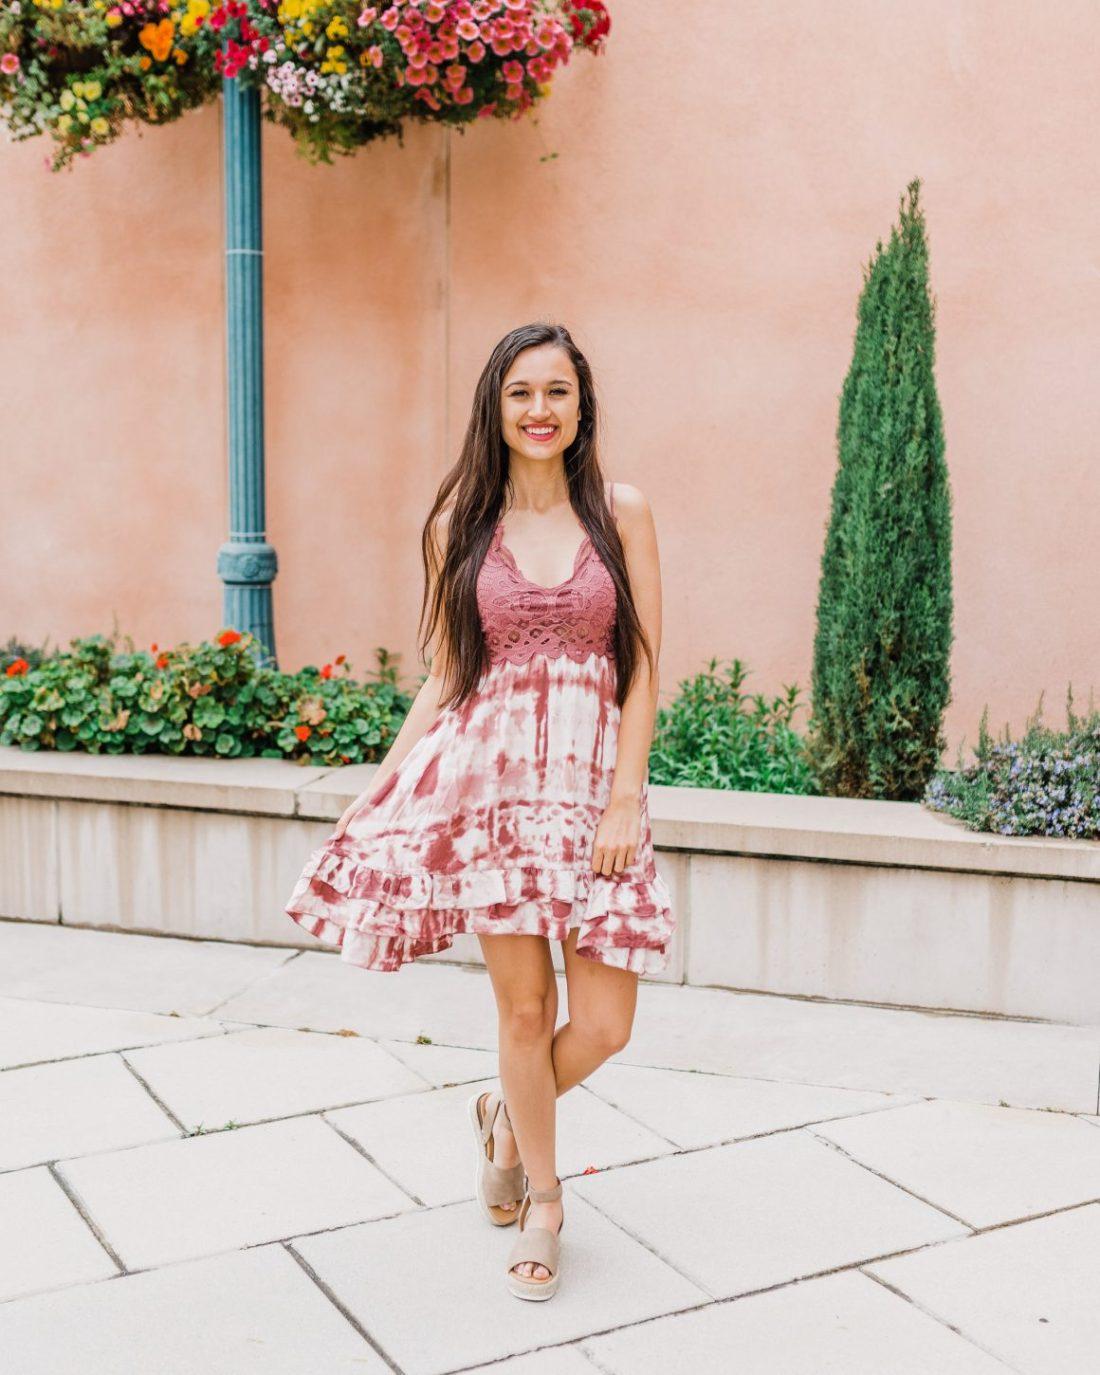 Springbreak Outfit Dress